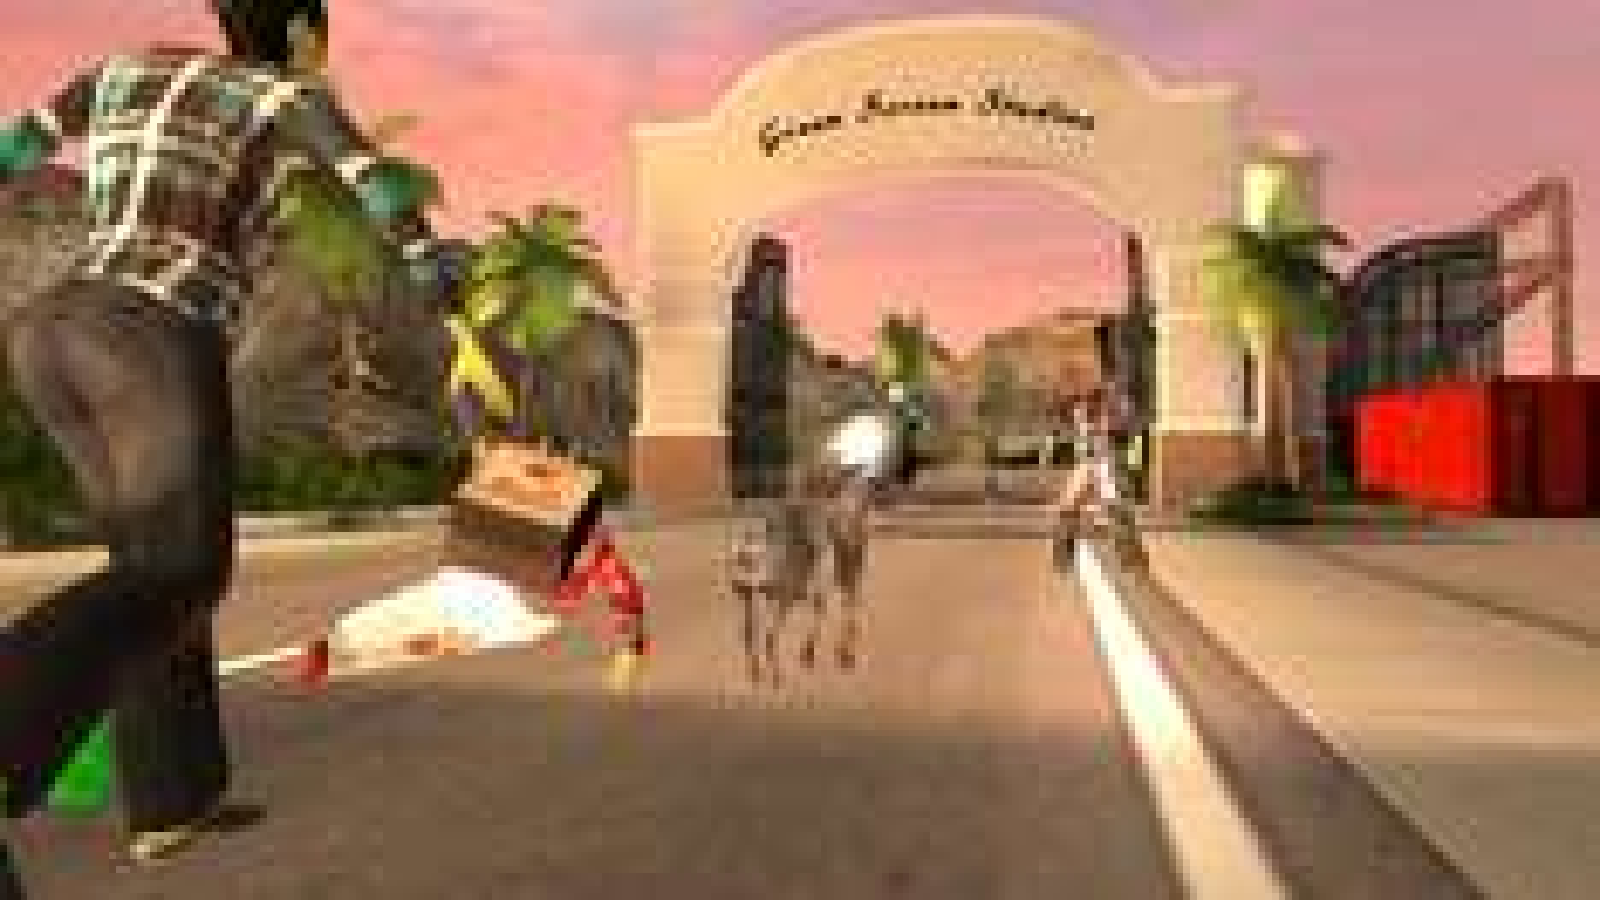 Play store: Goat simulator